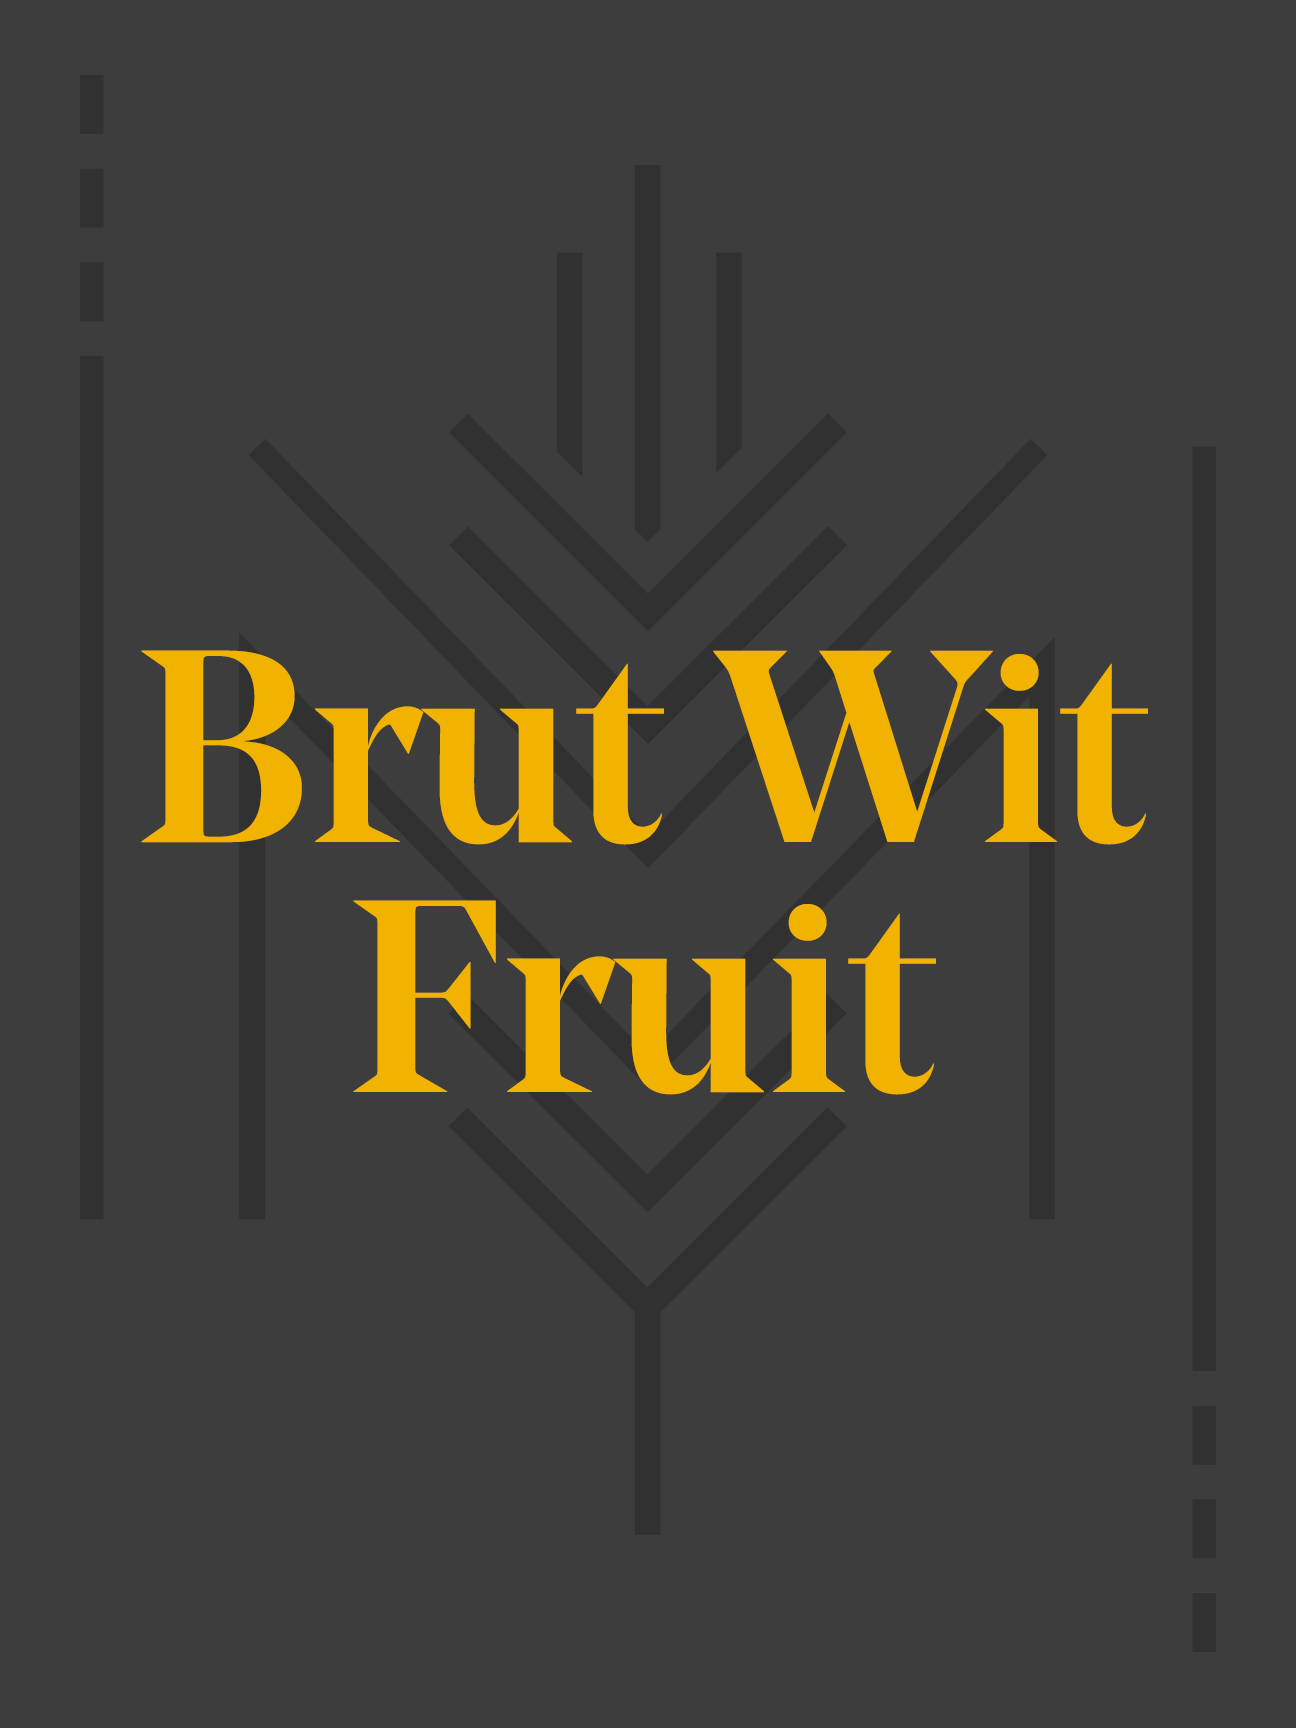 BrutWitFruit.png